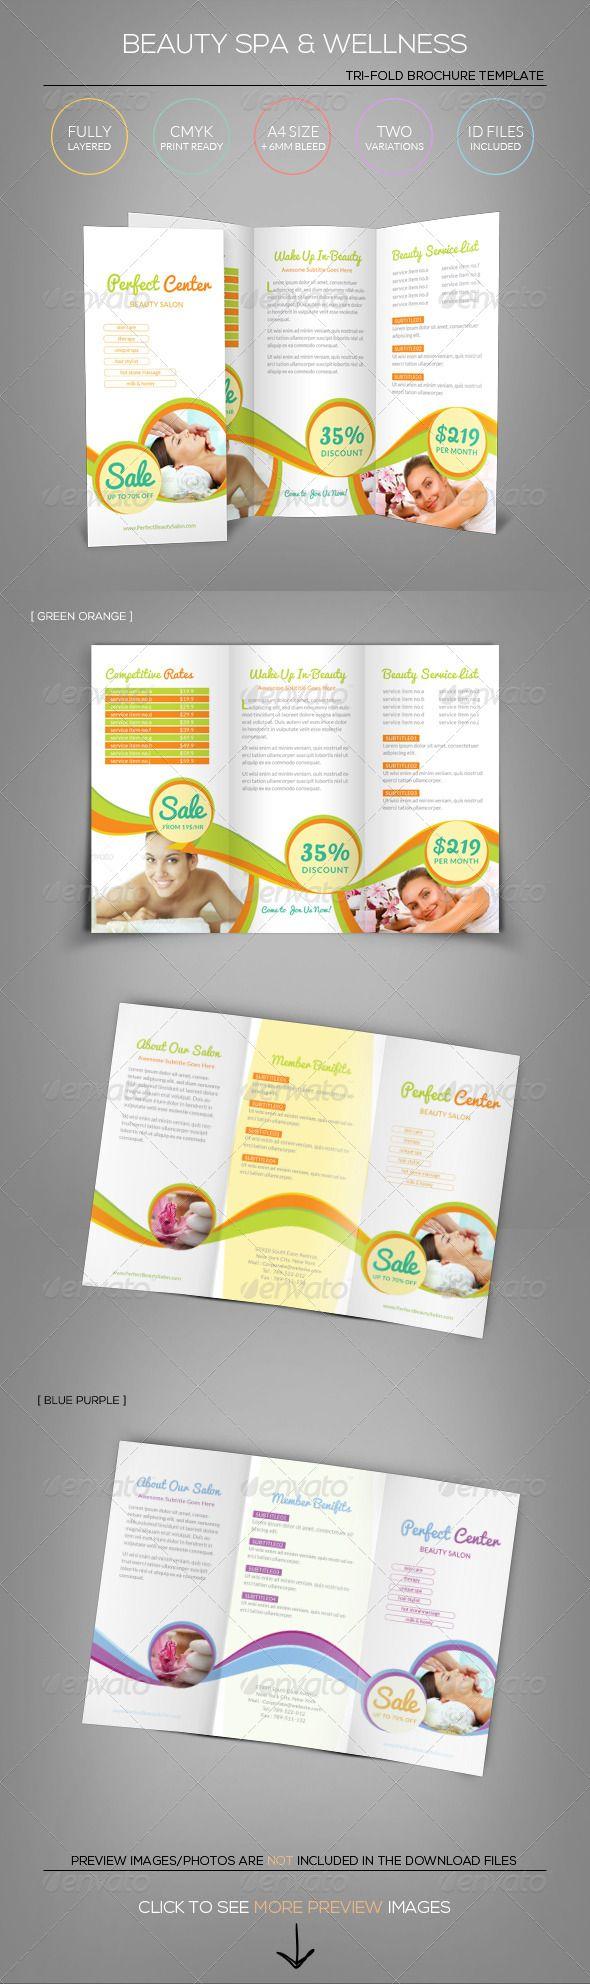 32 best Brochures images on Pinterest | Brochures, Layout design and ...